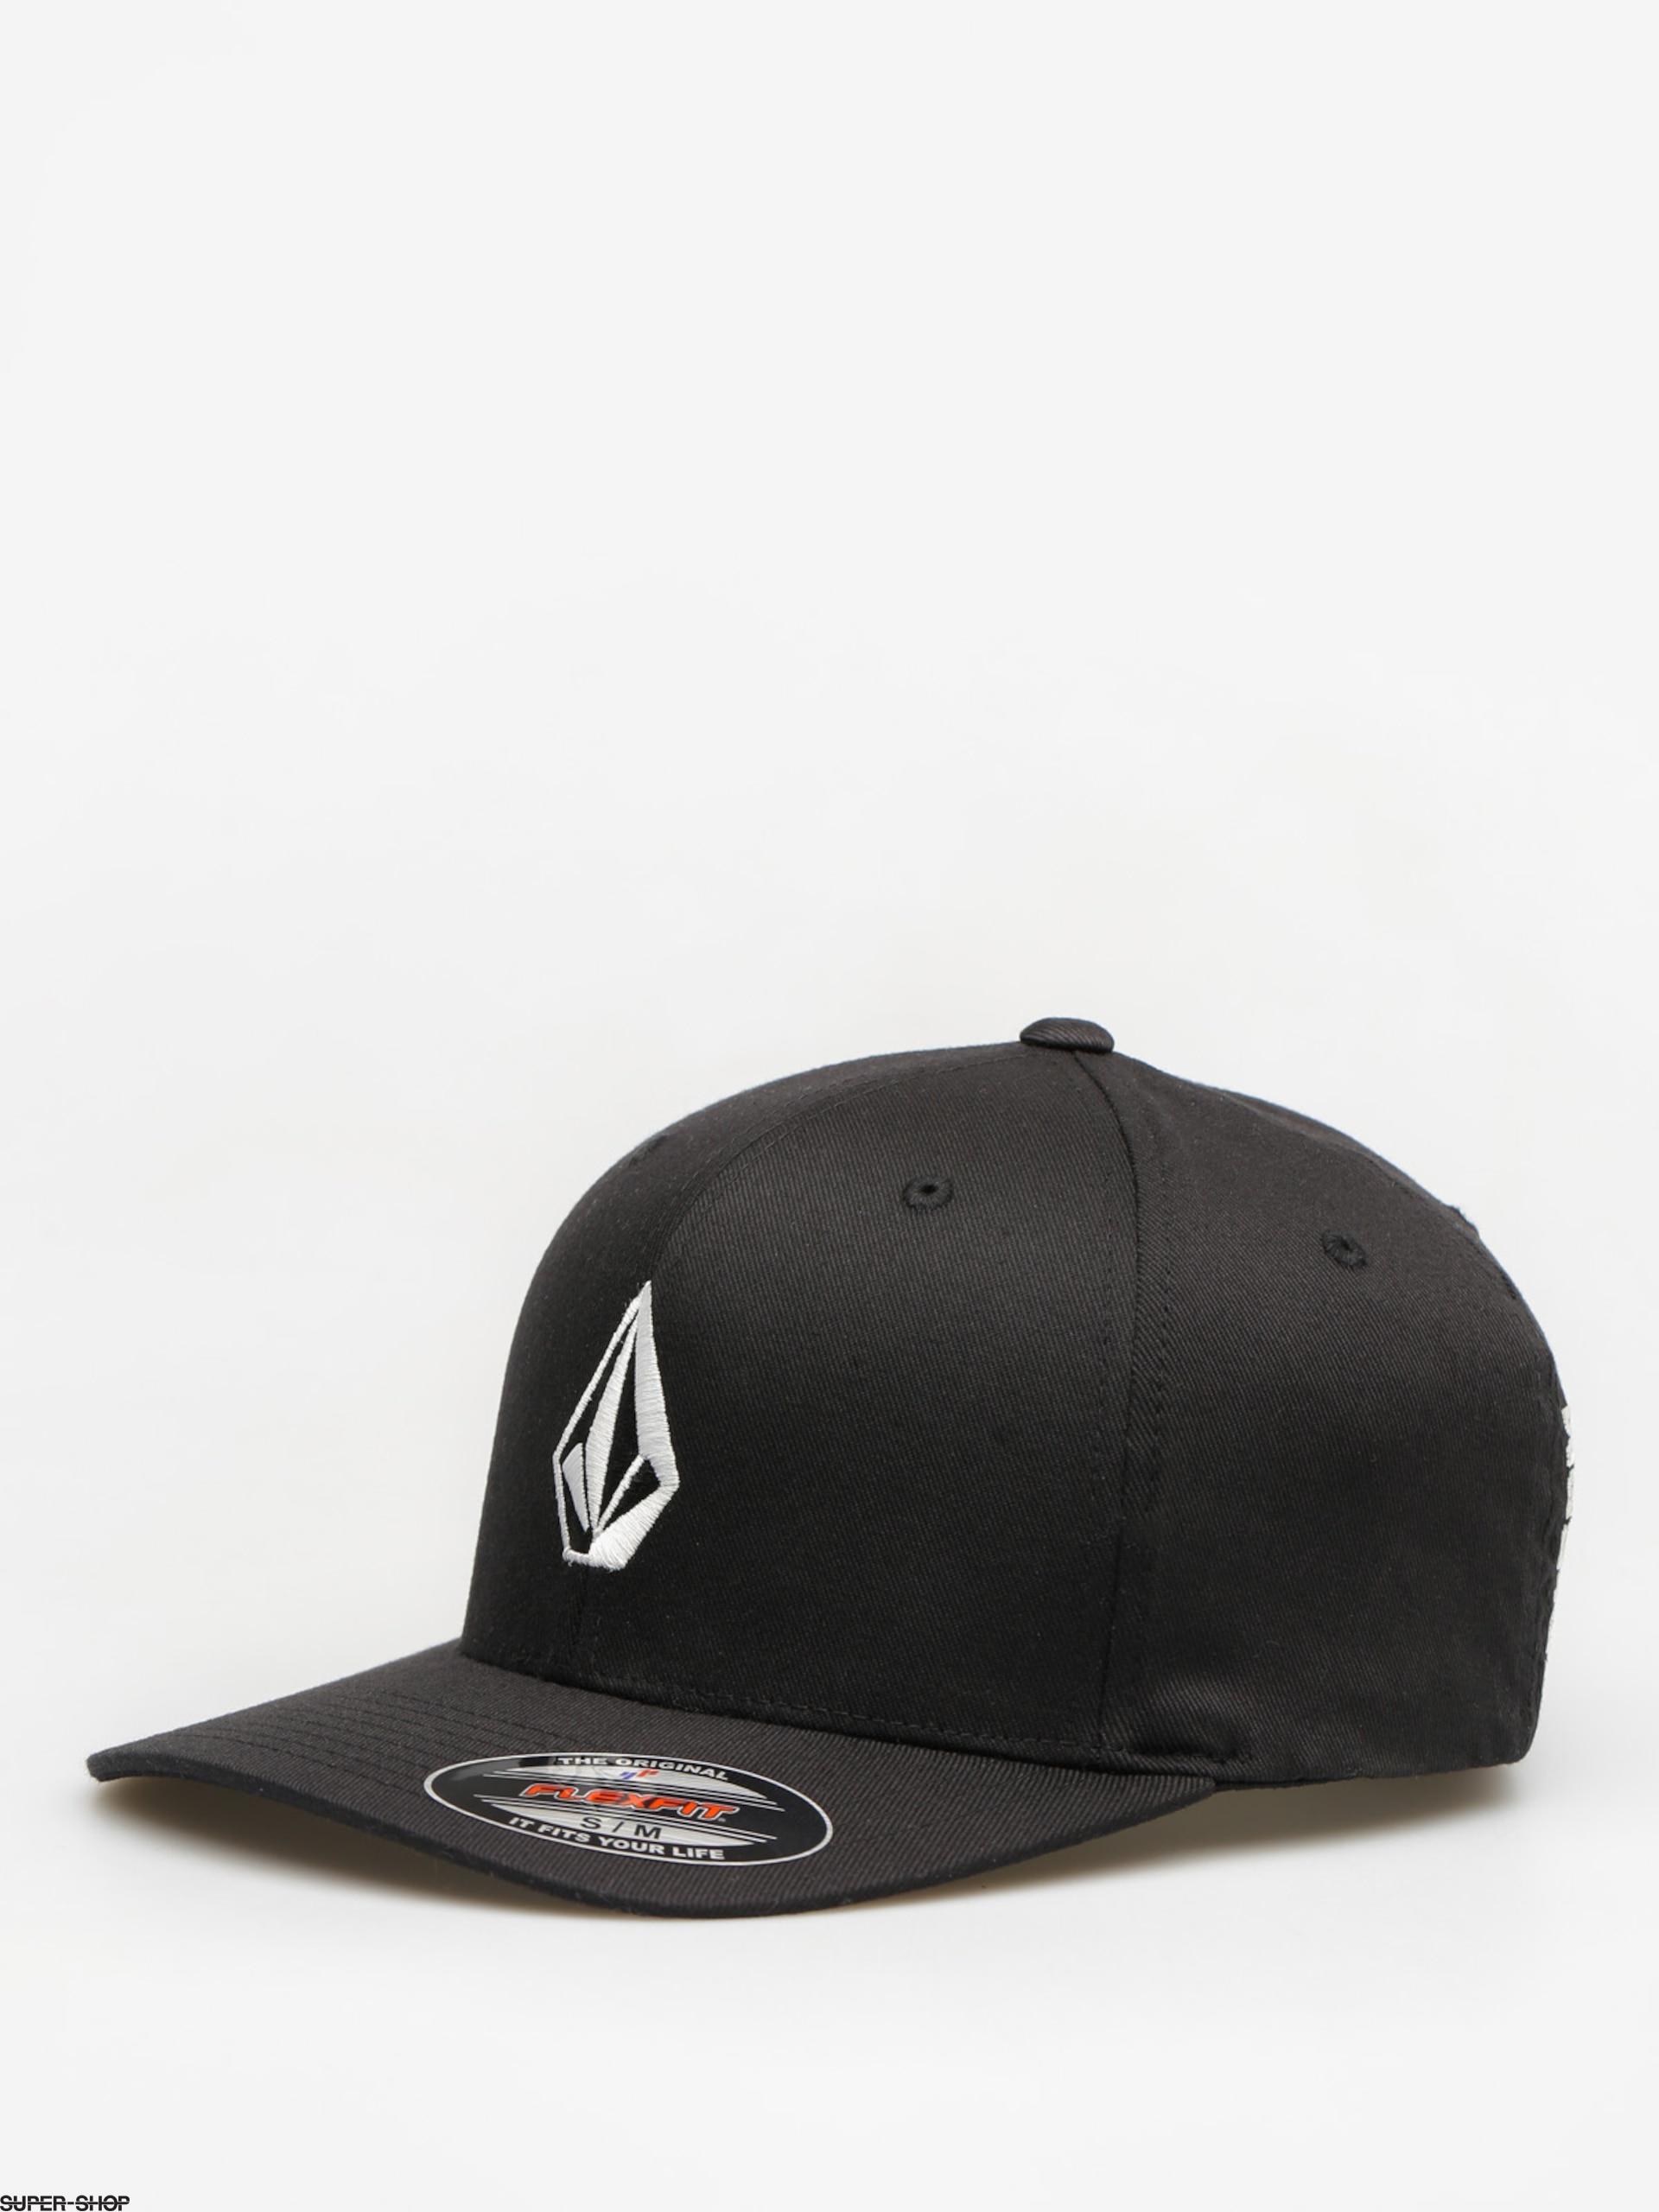 879180-w1920-volcom-cap-full-stone-xfit-hat-blk.jpg a9ee5afce606